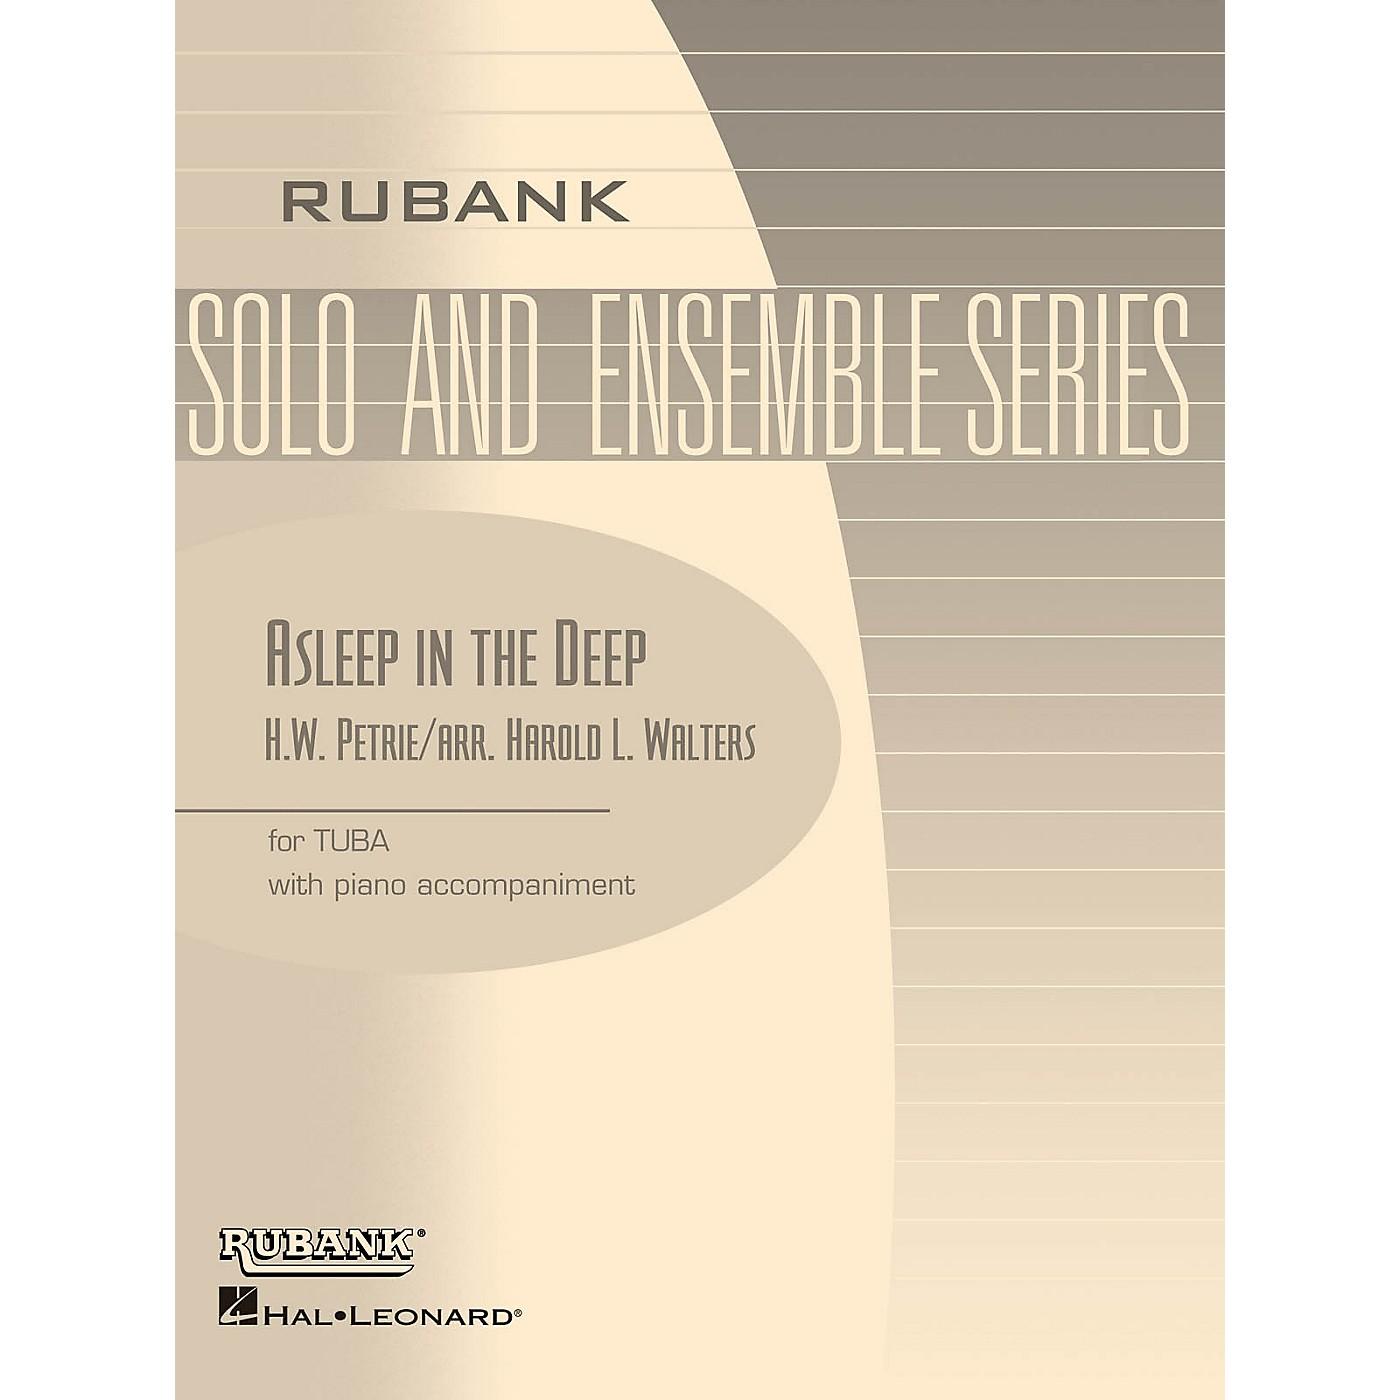 Rubank Publications Asleep in the Deep Rubank Solo/Ensemble Sheet Series Softcover thumbnail